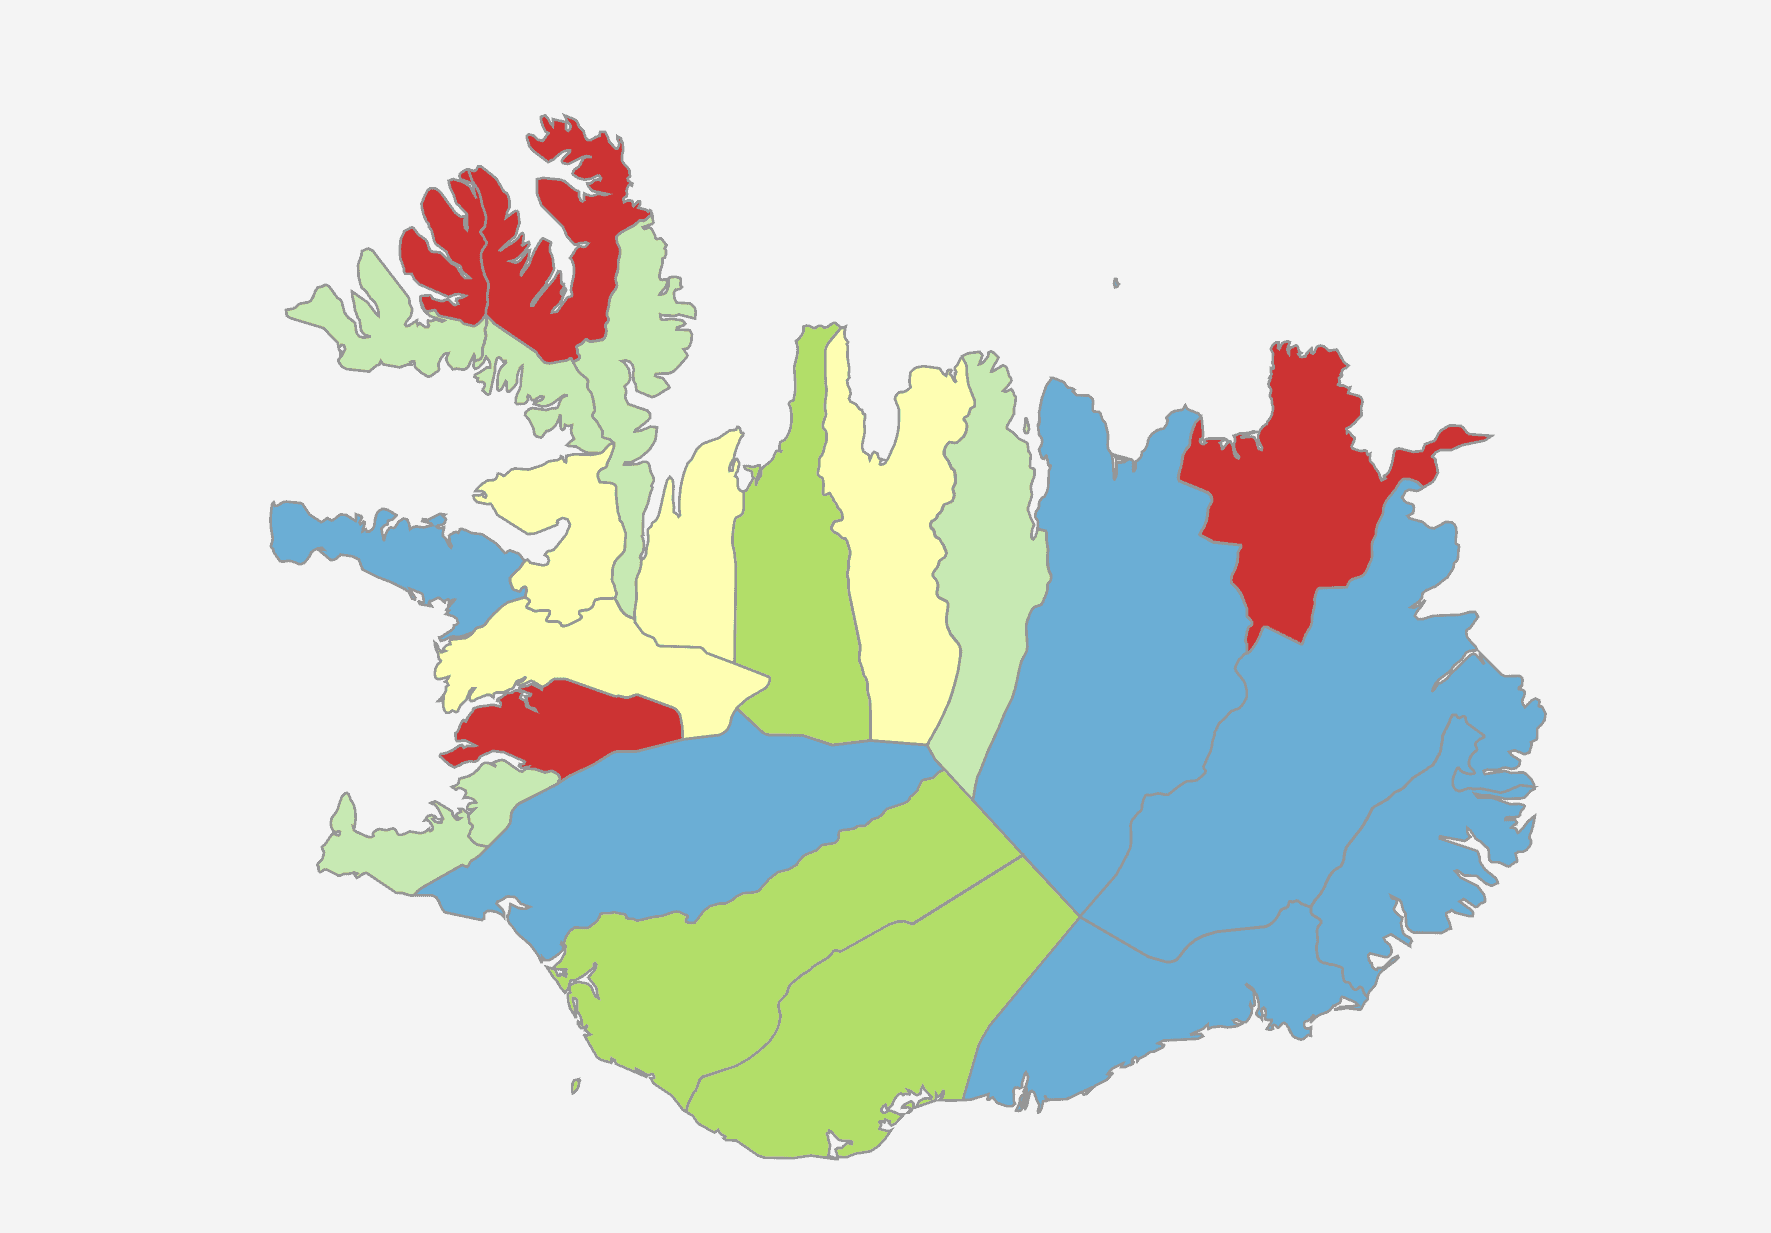 iceland mapchart europe detailed create